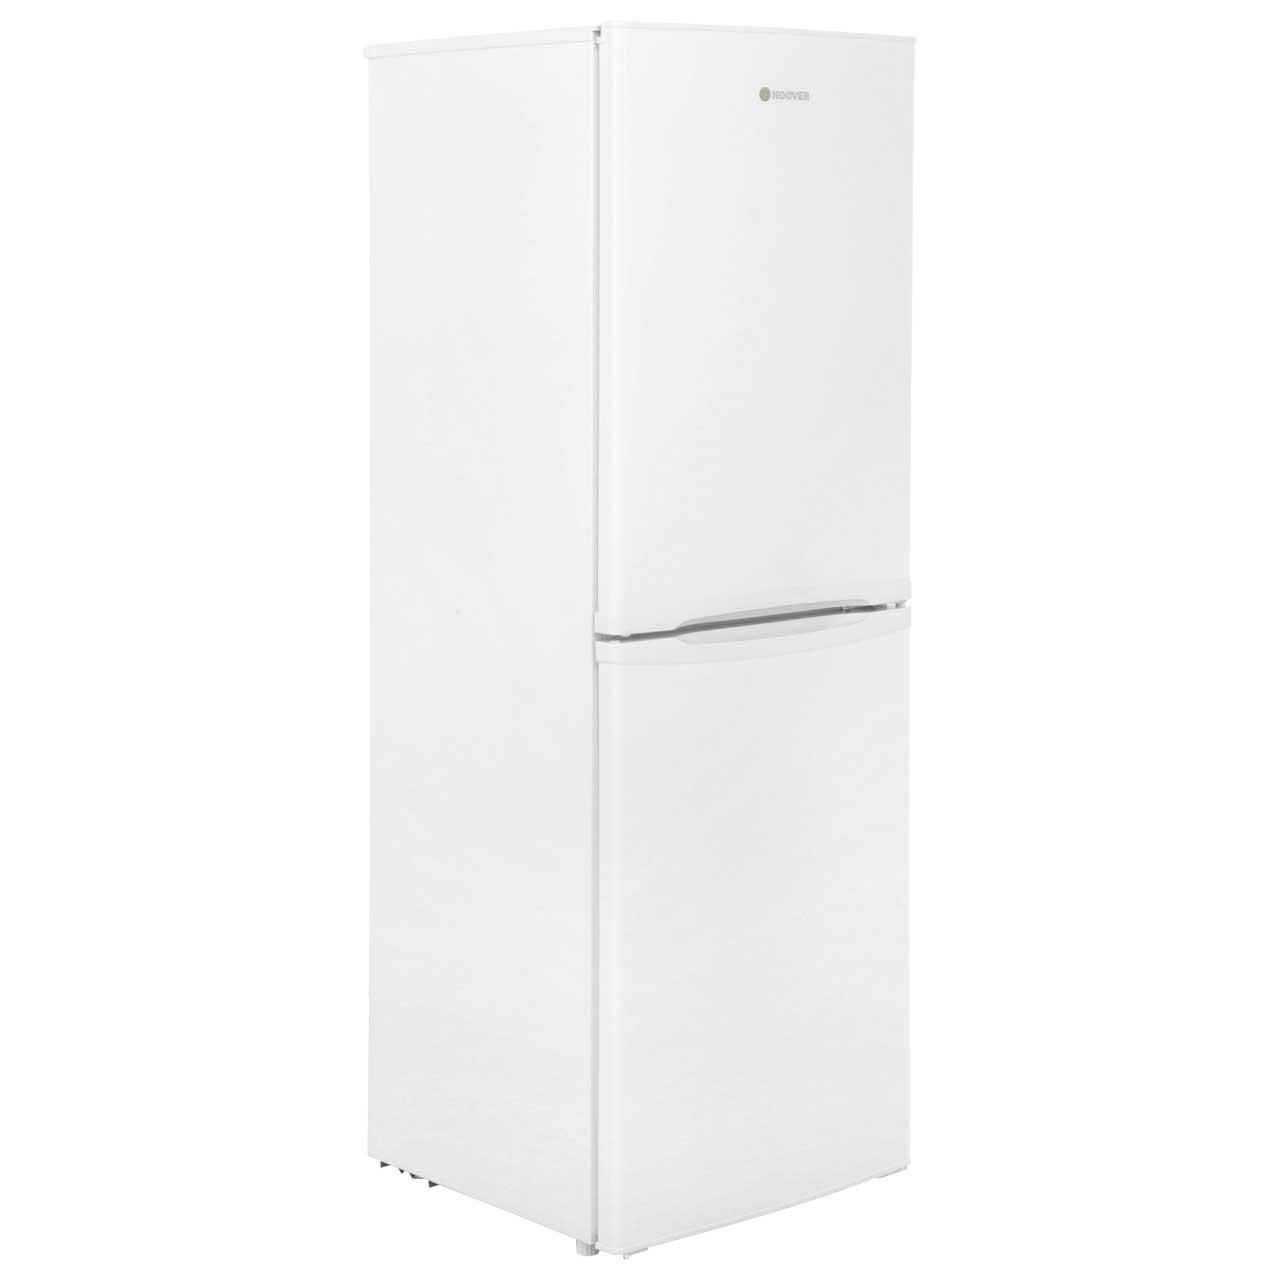 Hoover HVBS5162WK Free Standing Fridge Freezer in White